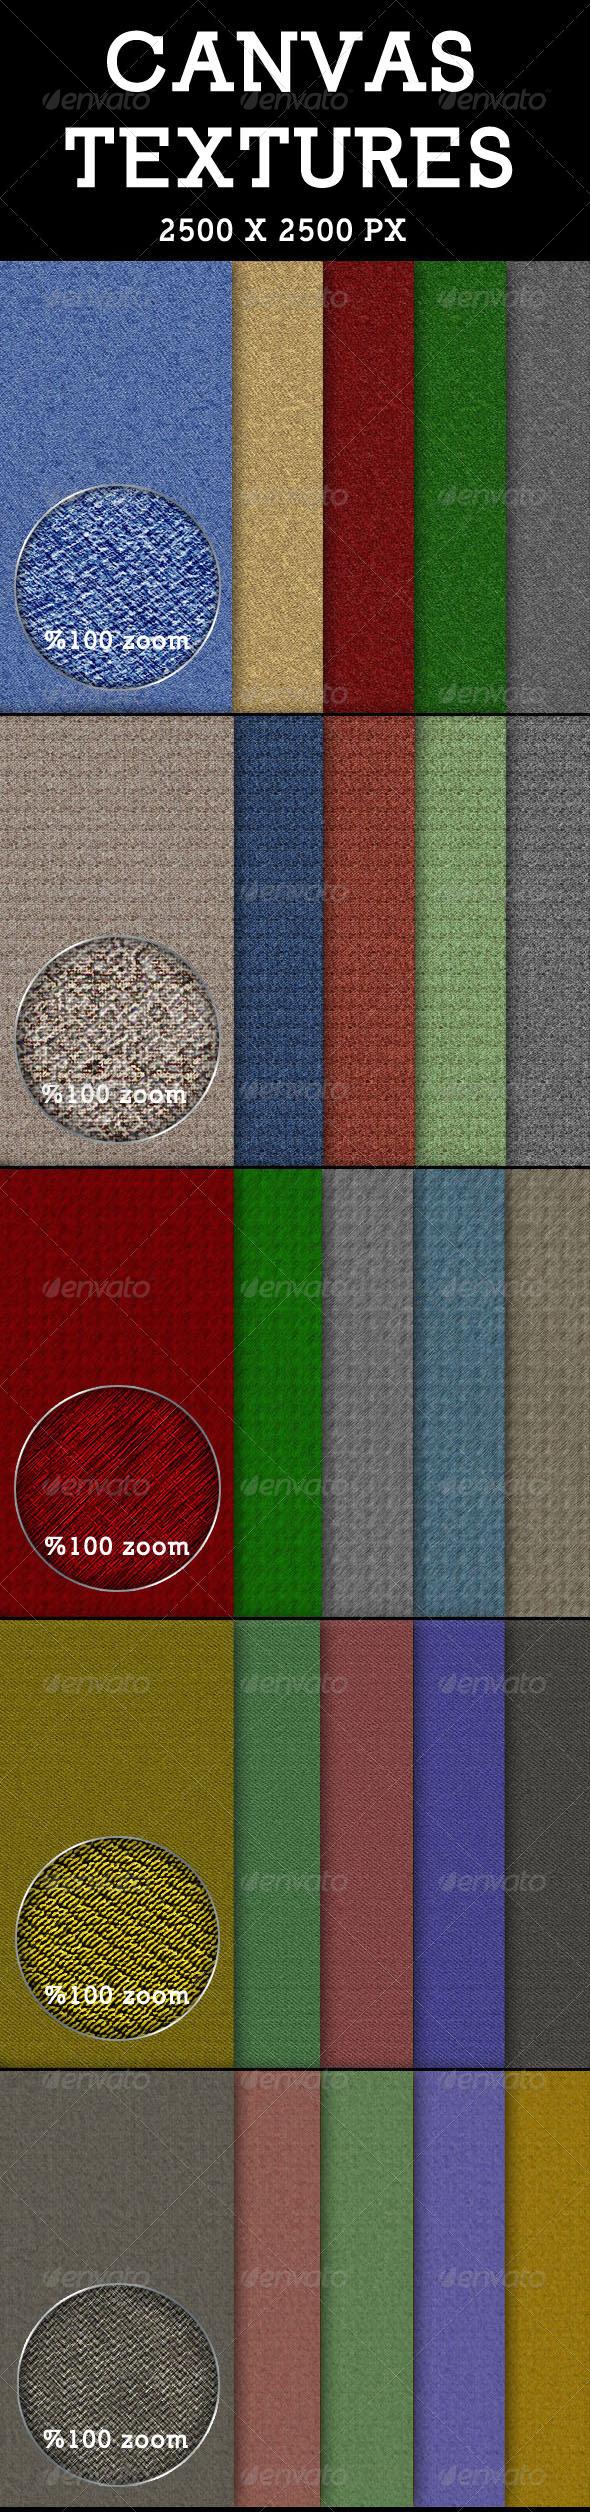 GraphicRiver Canvas Textures 5475806